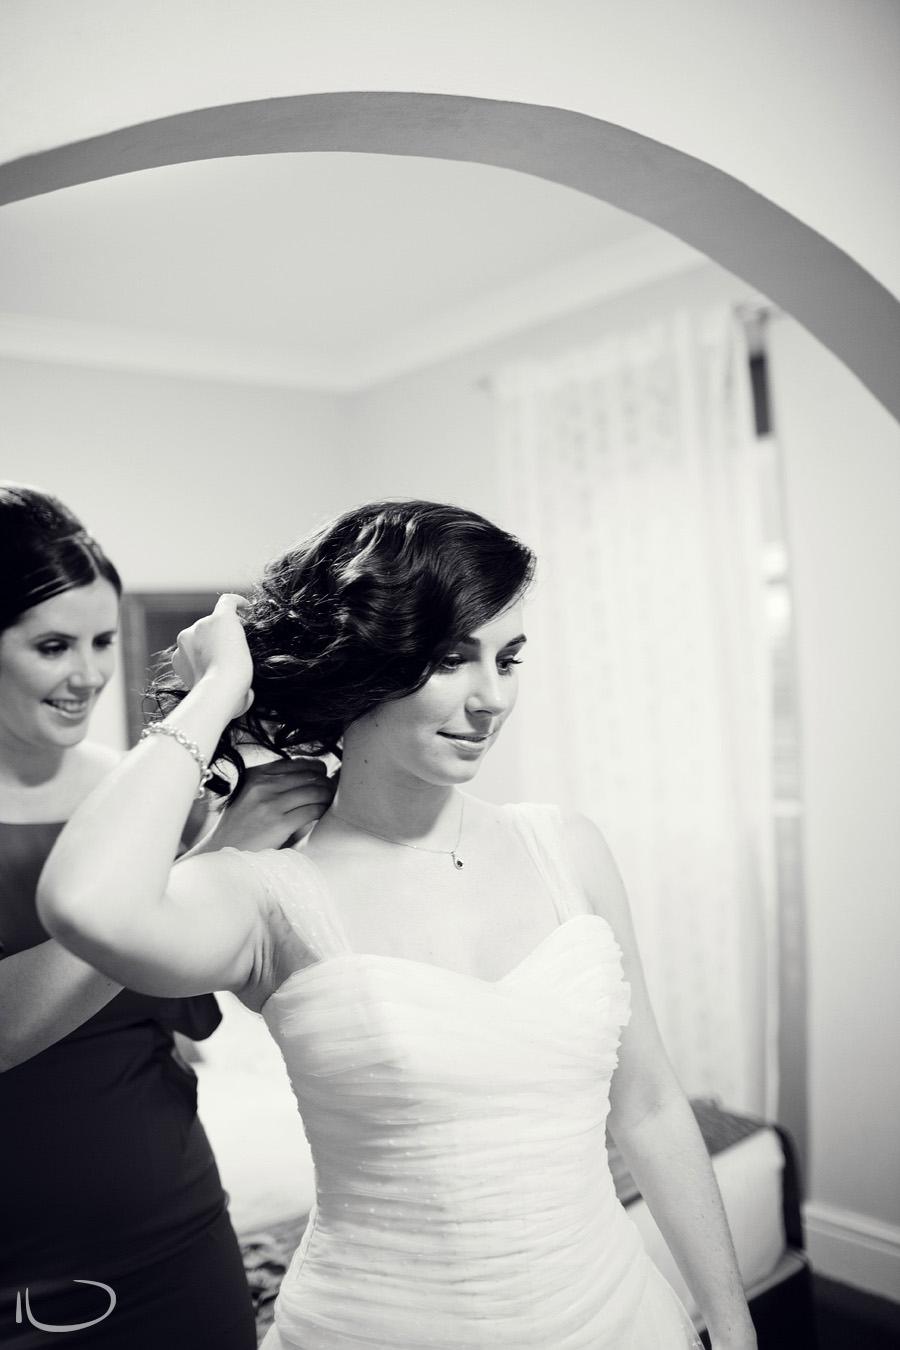 Sydney Wedding Photographer: Bridesmaid putting necklace on bride